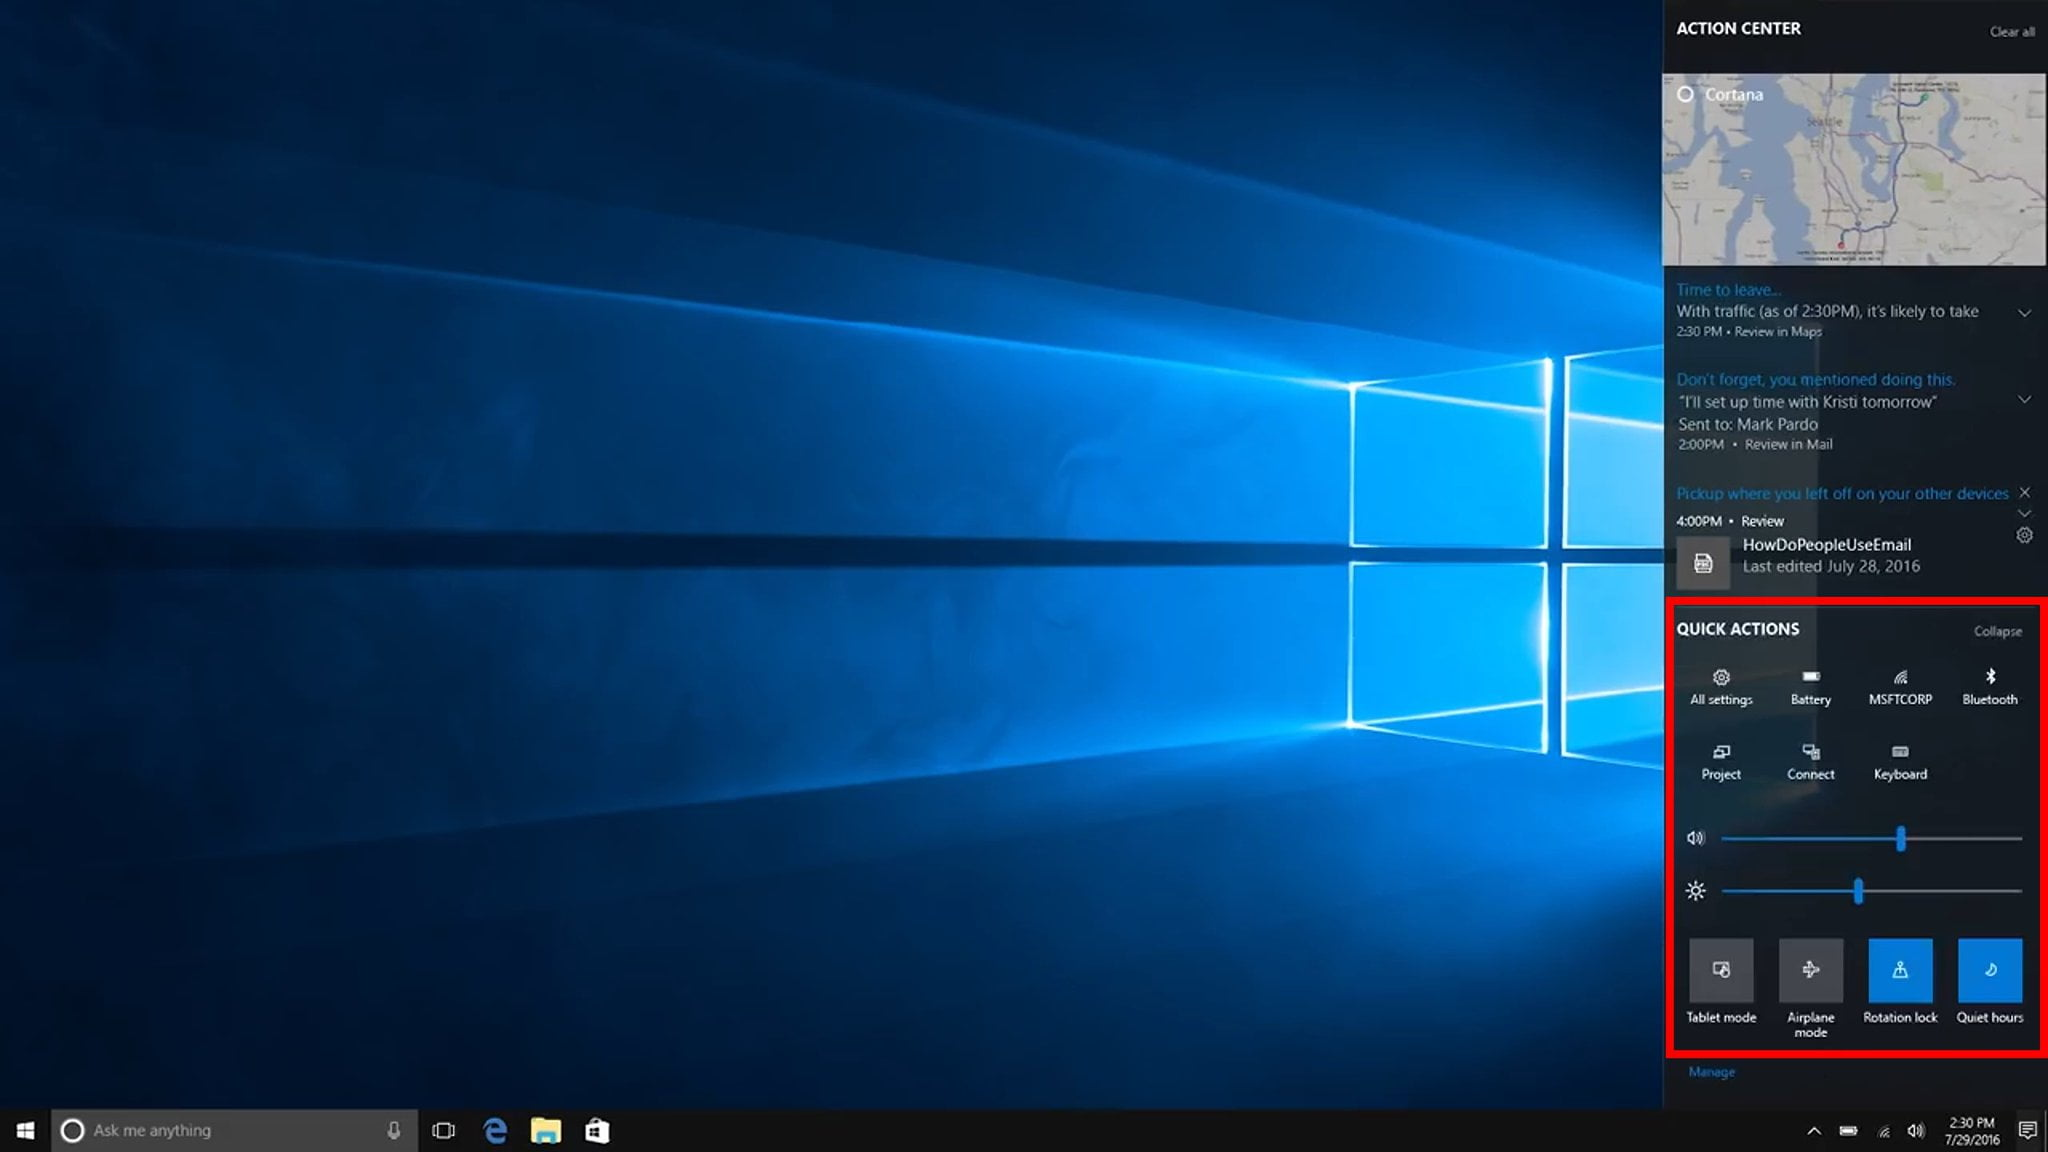 action-center-windows-10-creators-update